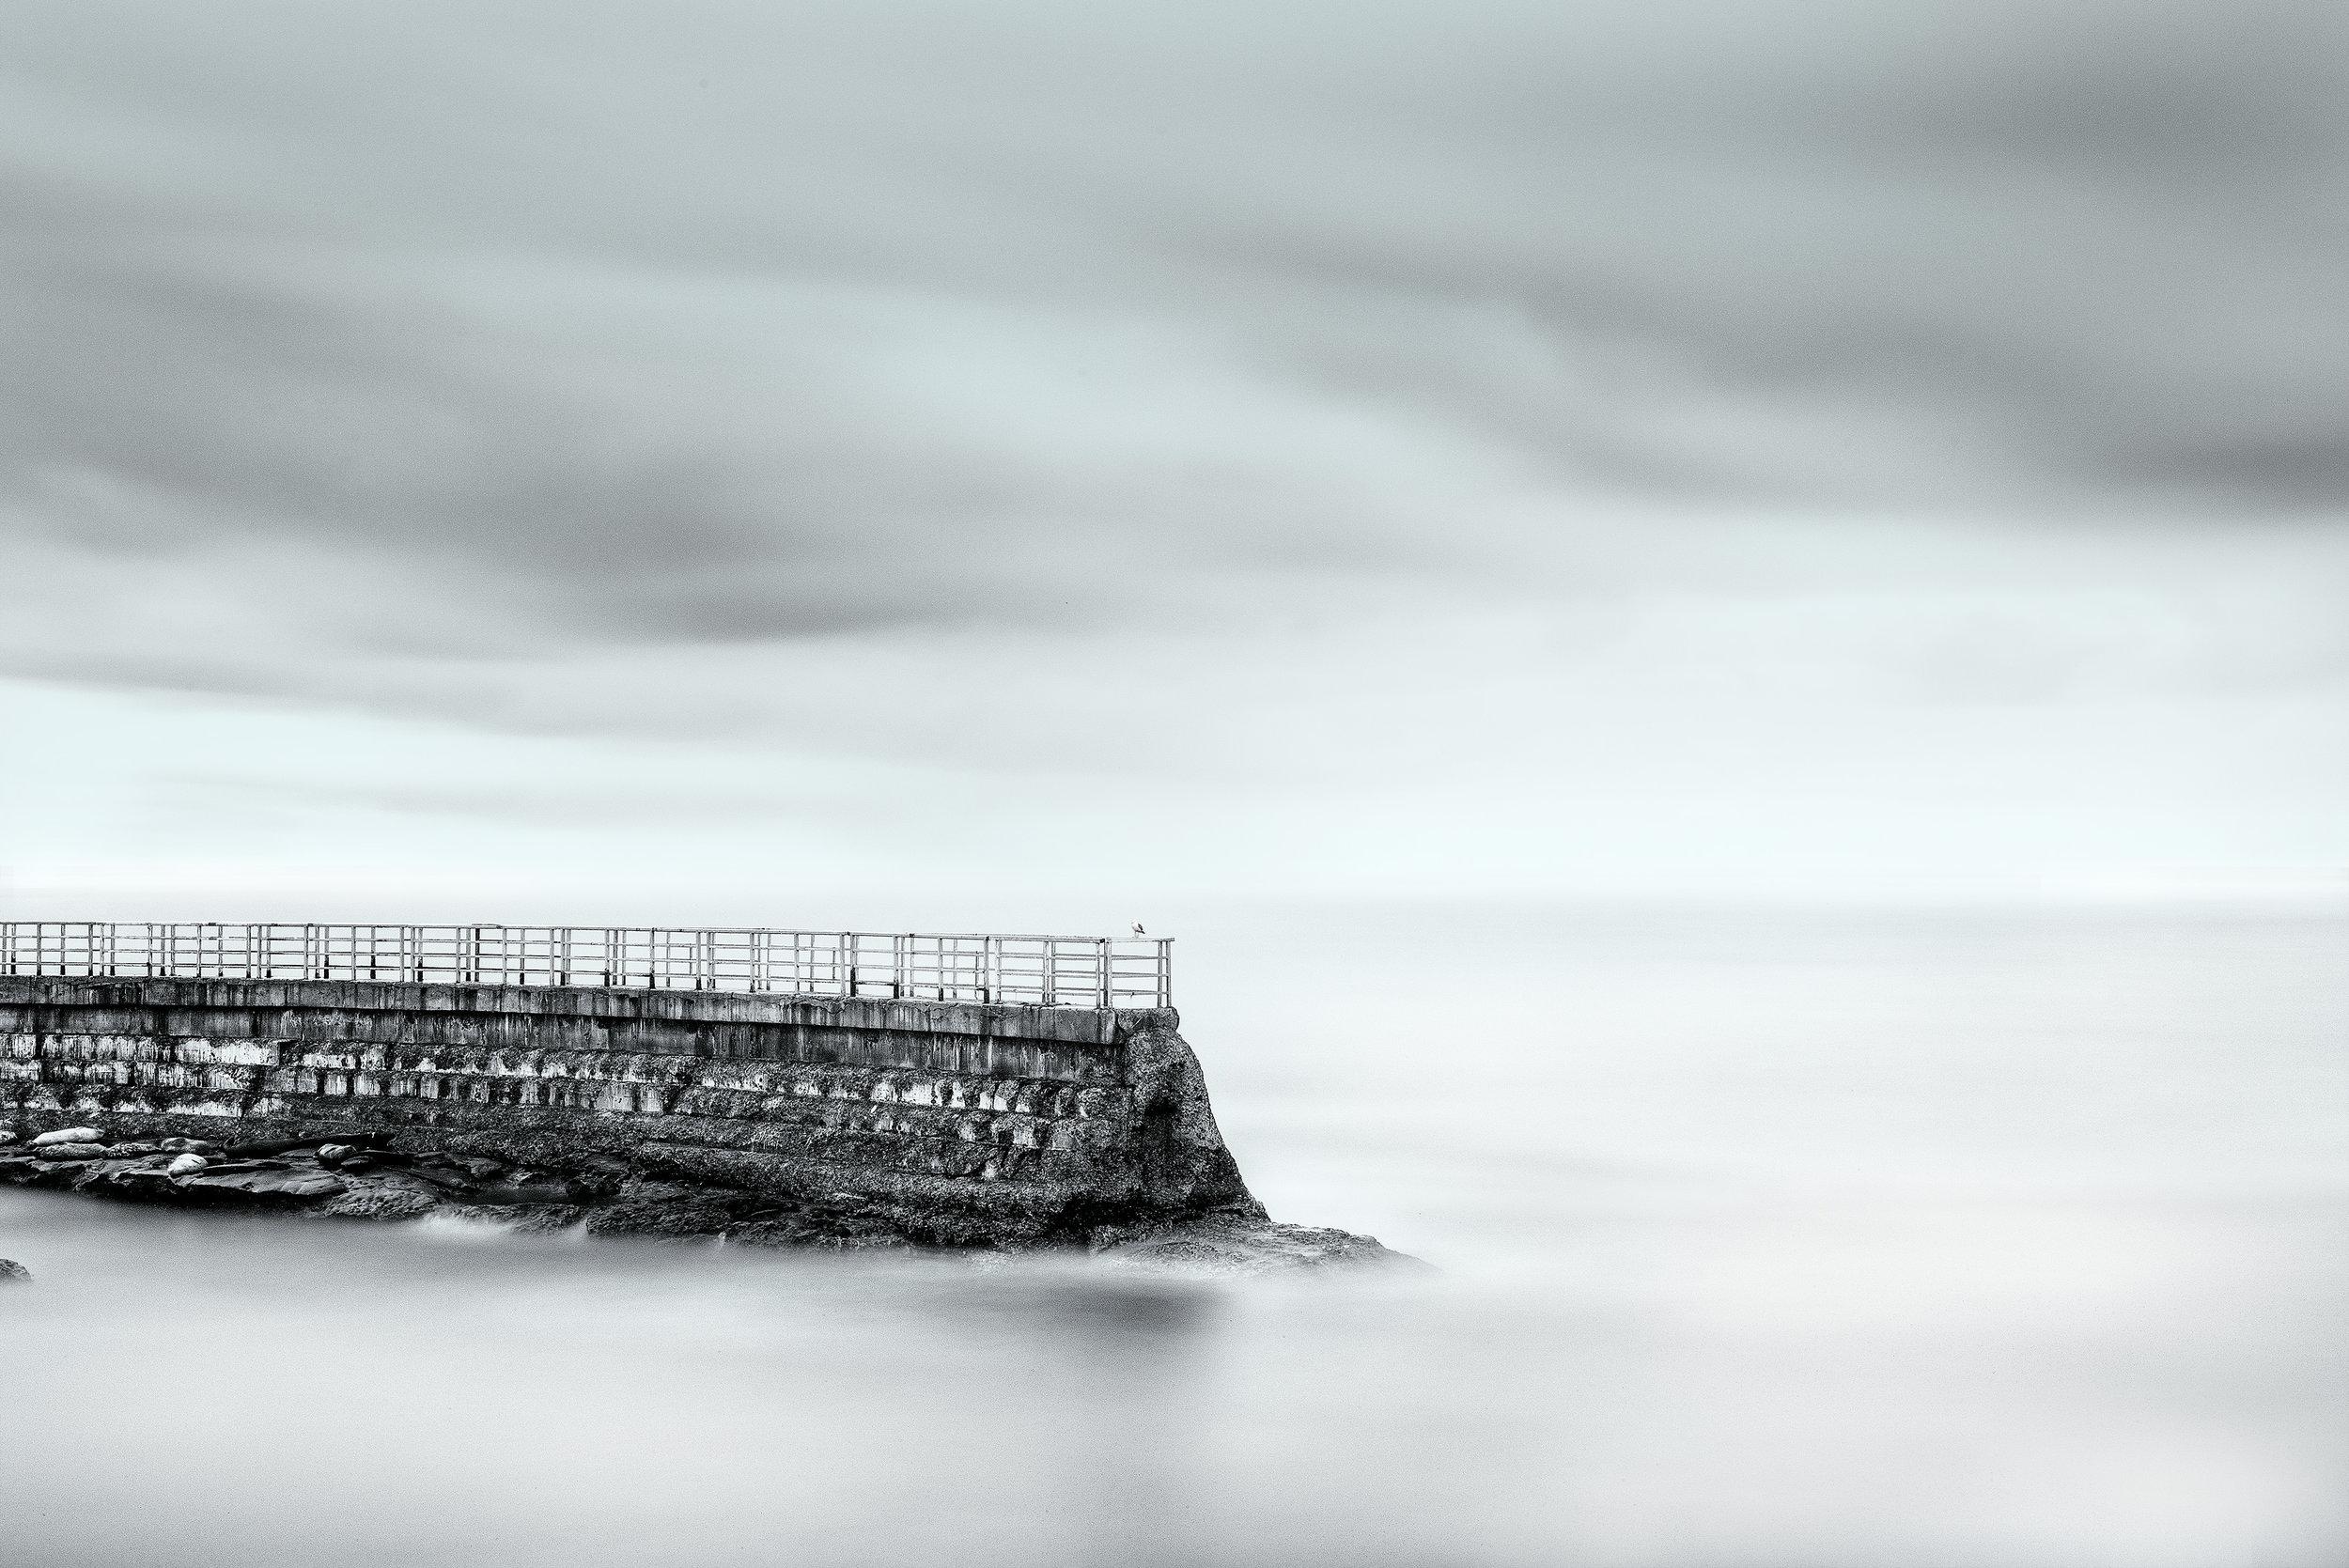 austin-trigg-southern-california-Childrens-pool-la-jolla-black-white-long-exposure-daytime-ocean-san-diego-california.jpg